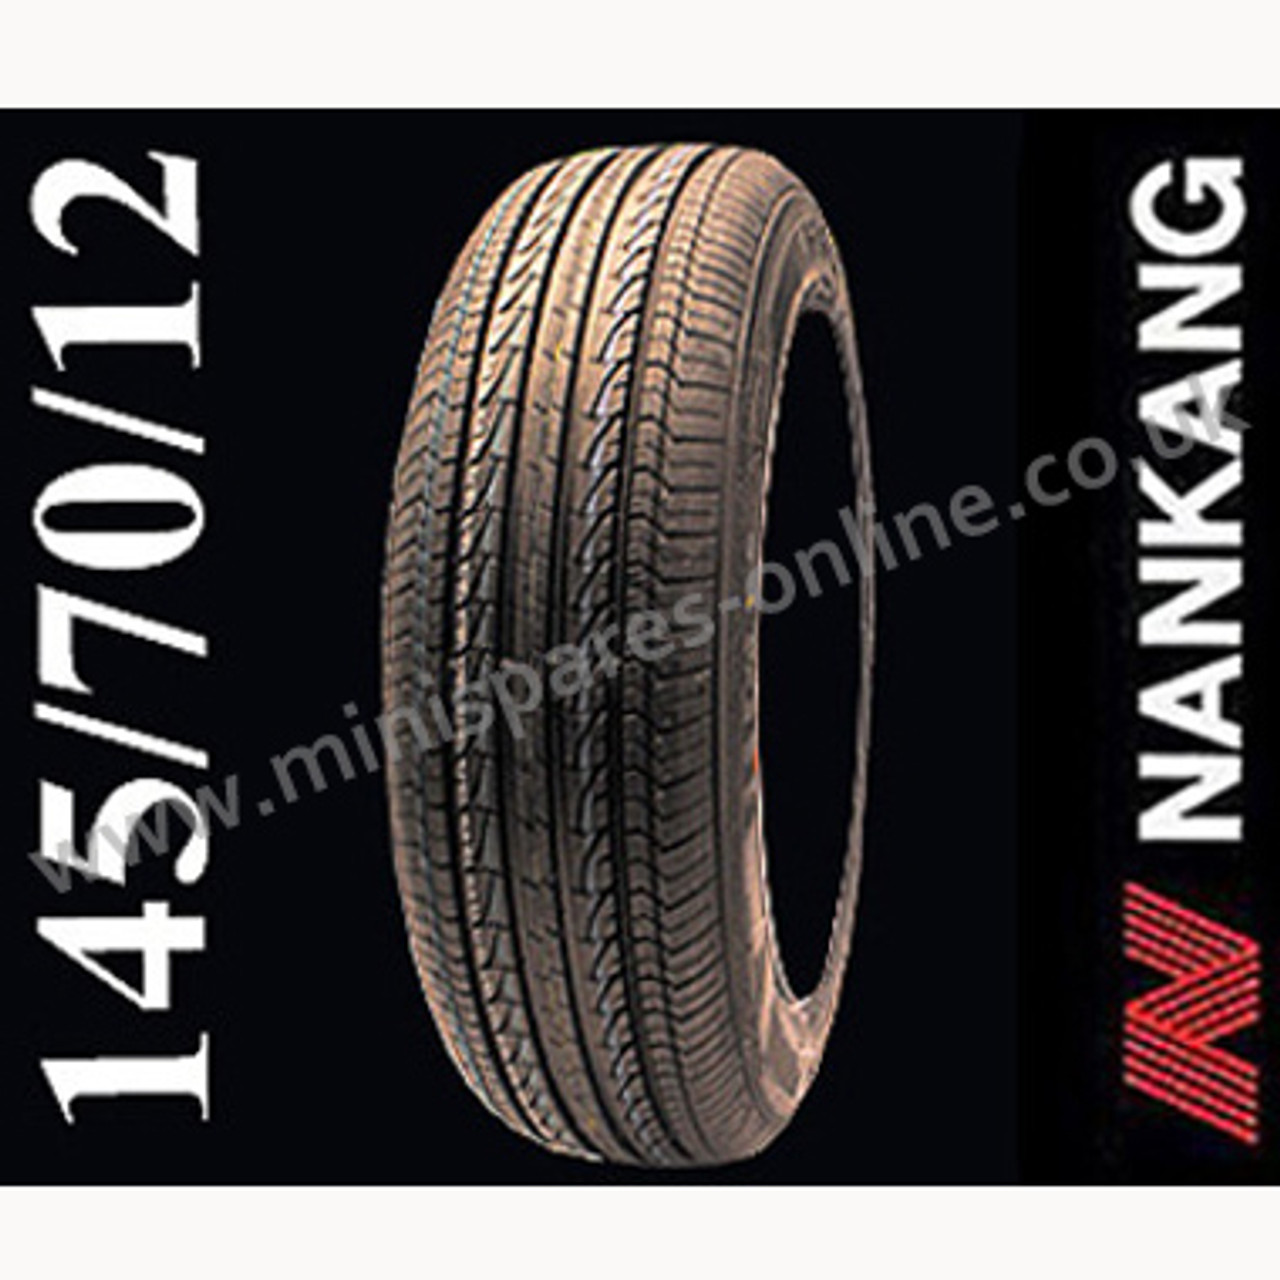 Nankang 145/70/12 tyre for Classic Mini